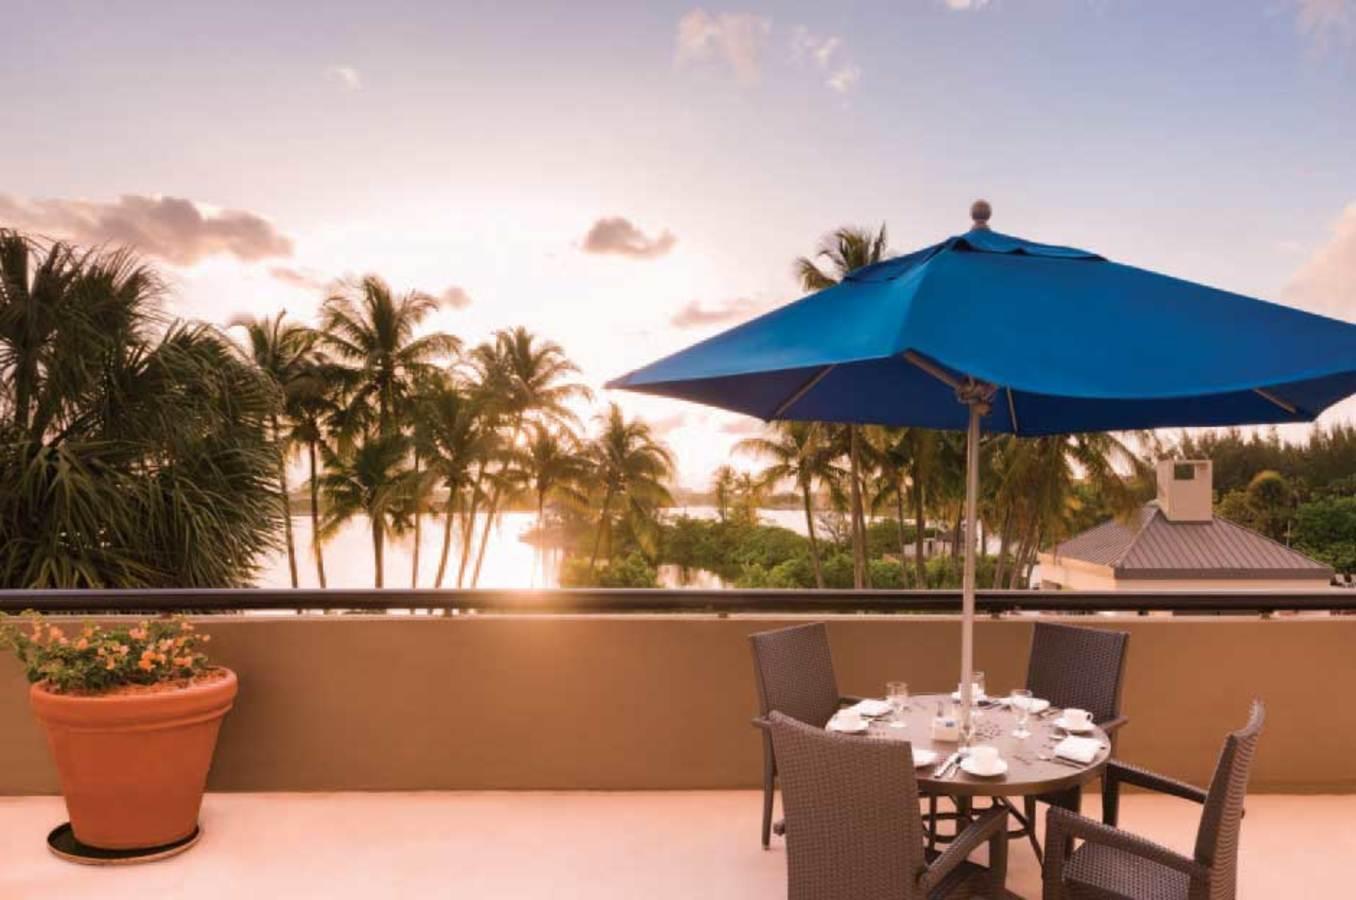 Dusk at the Hilton Miami Airport Blue Lagoon Sugarloaf Terrace